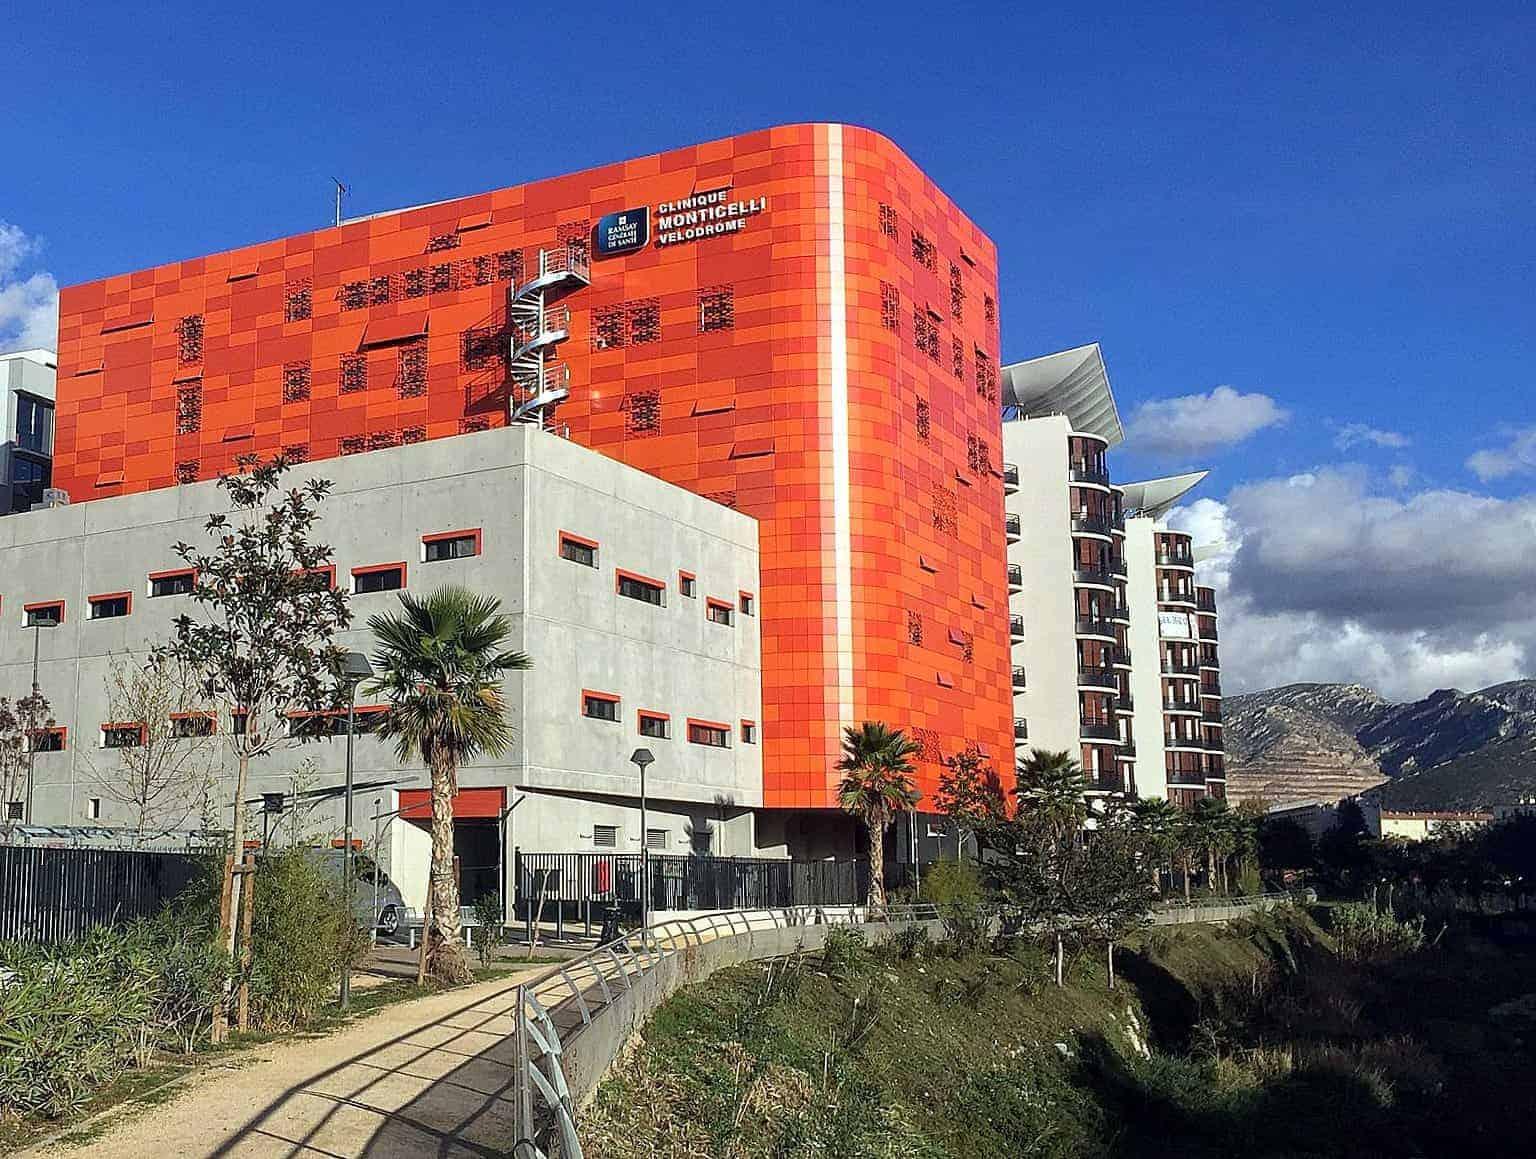 clinique-monticelli-orange-velodrome